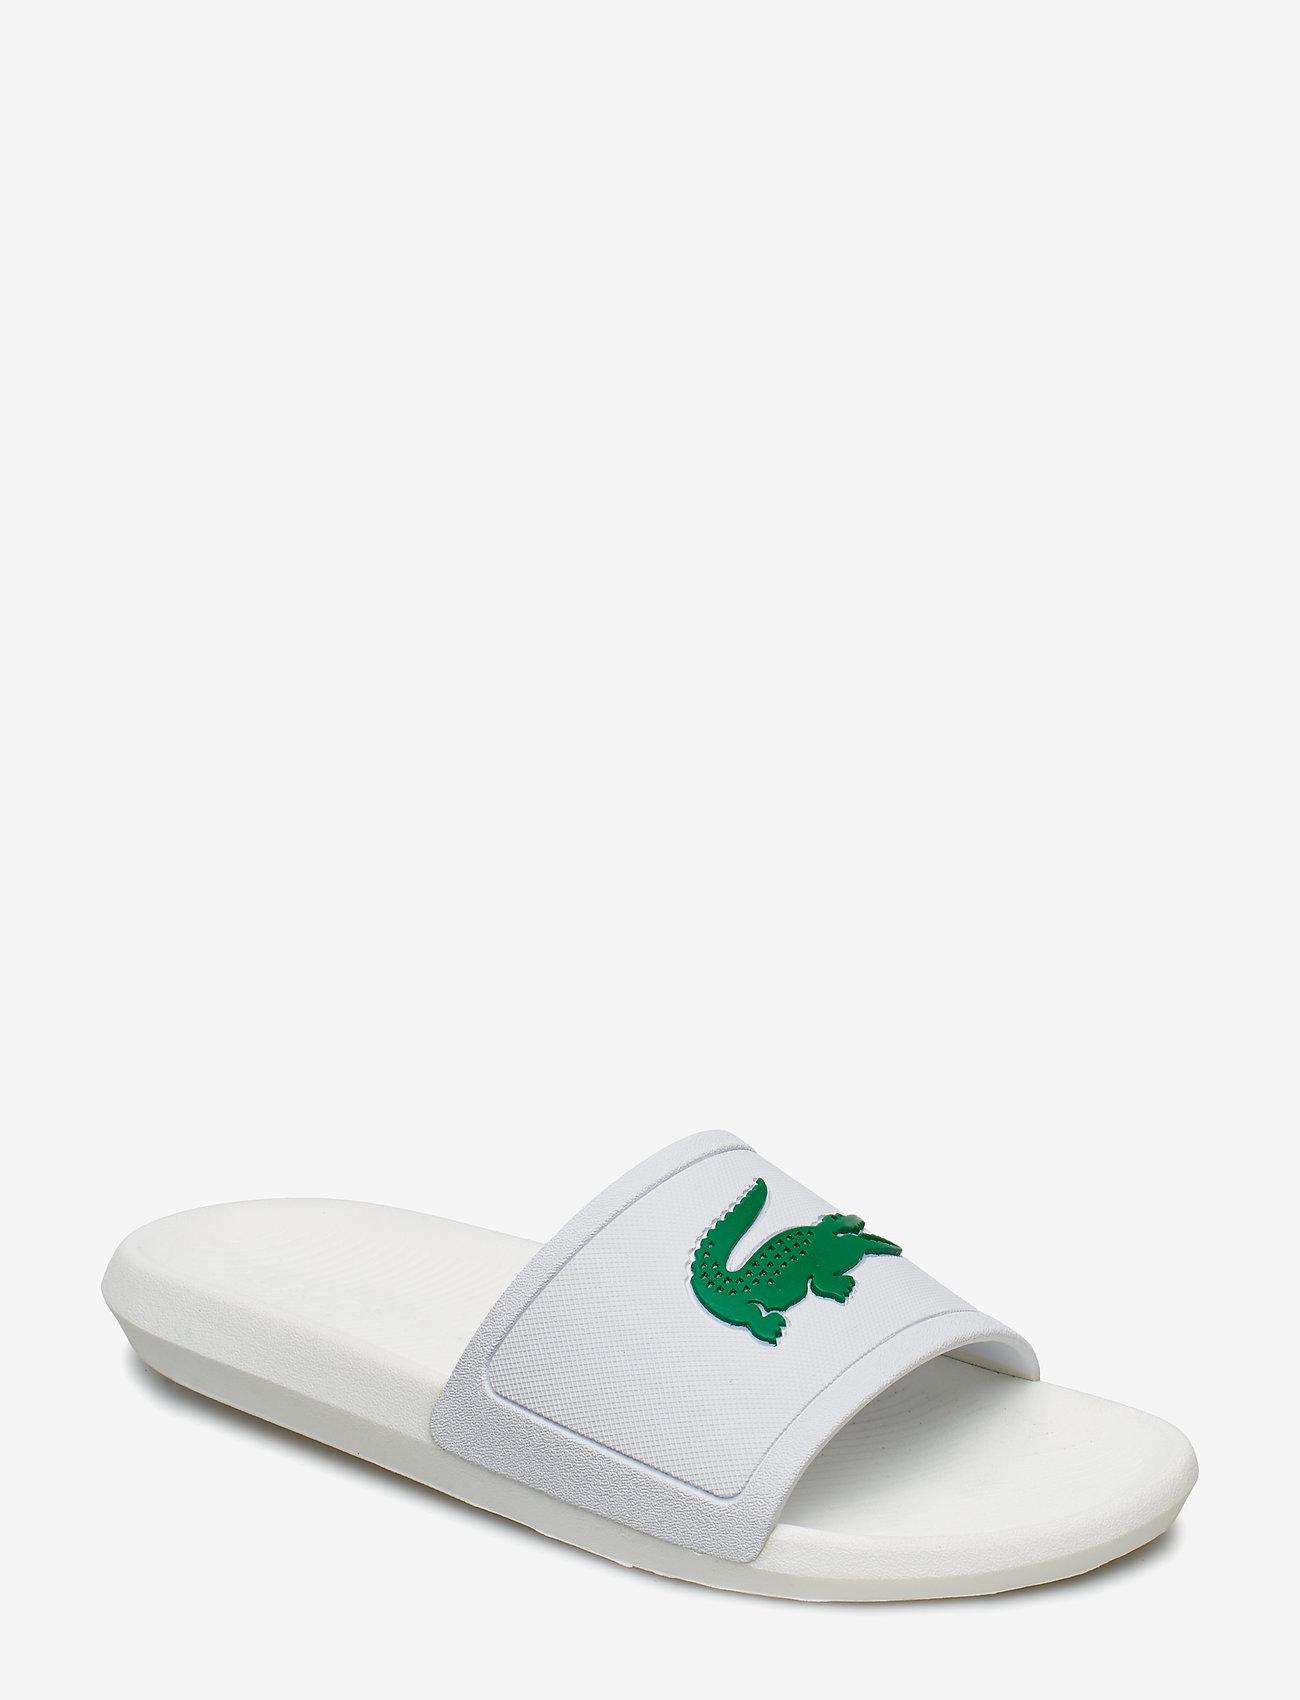 Lacoste Shoes - CROCO SLIDE 119 1CMA - pool sliders - wht/grn syn - 0